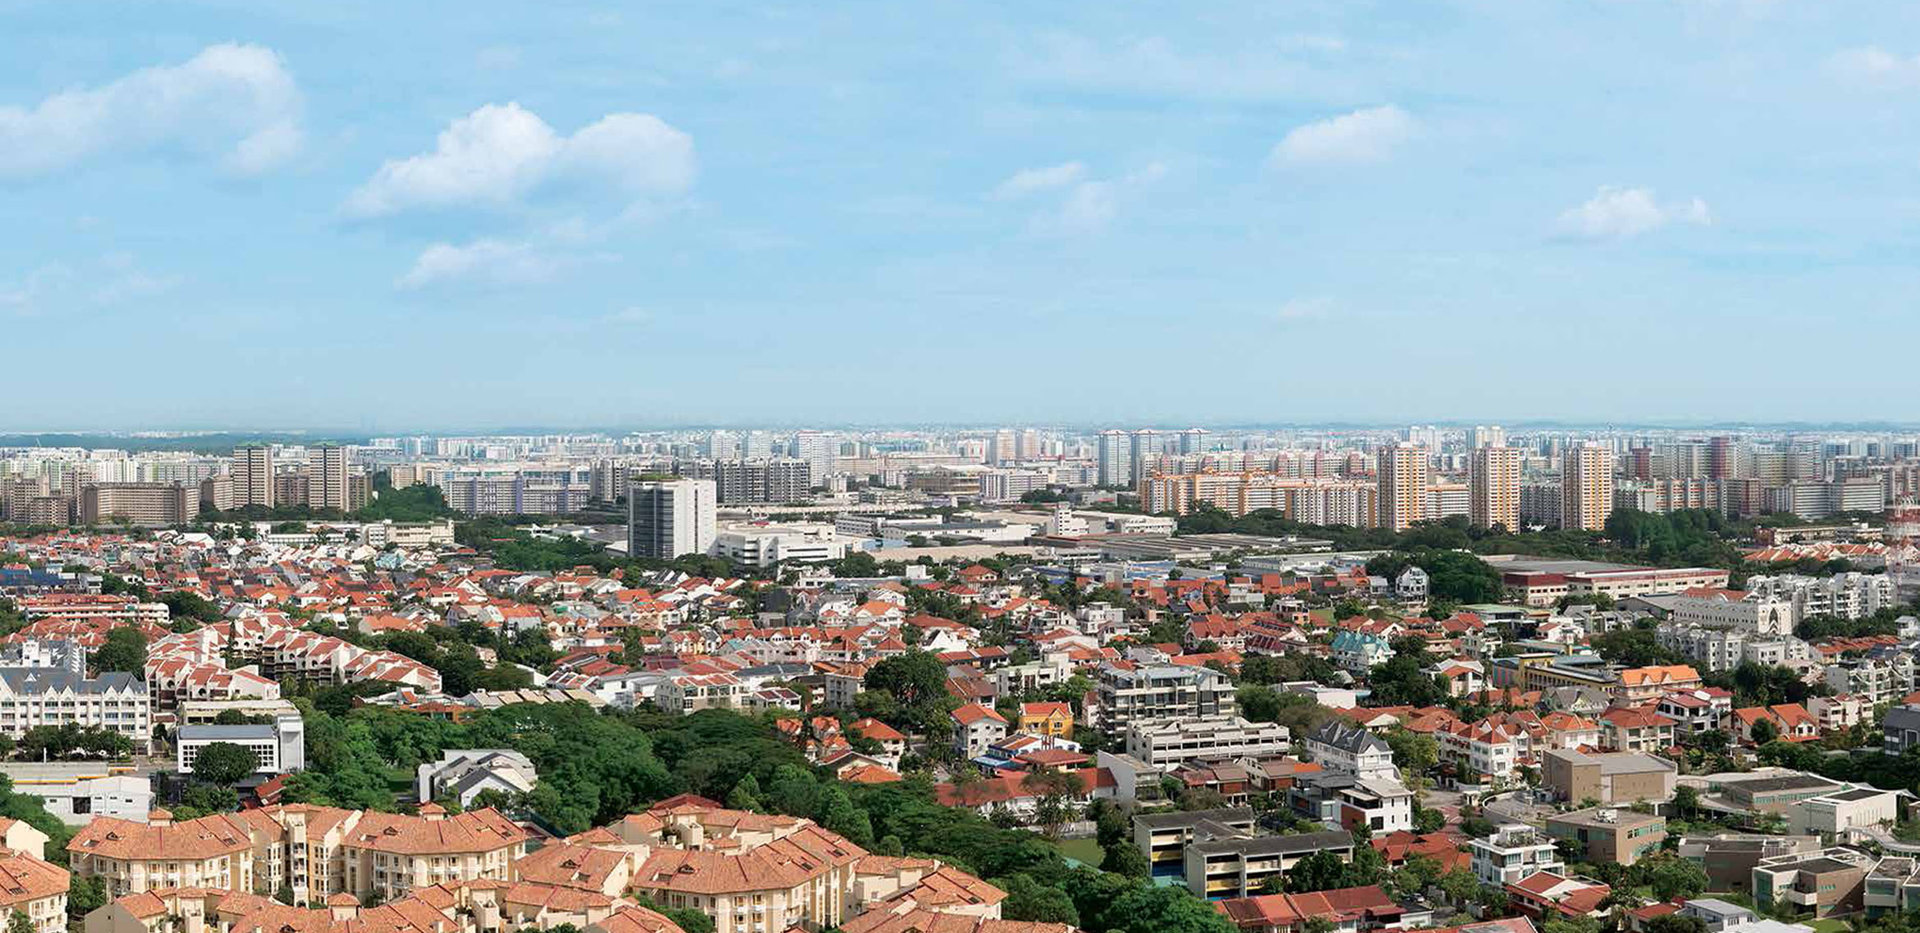 seaside-residences-singapore-unblocked-l